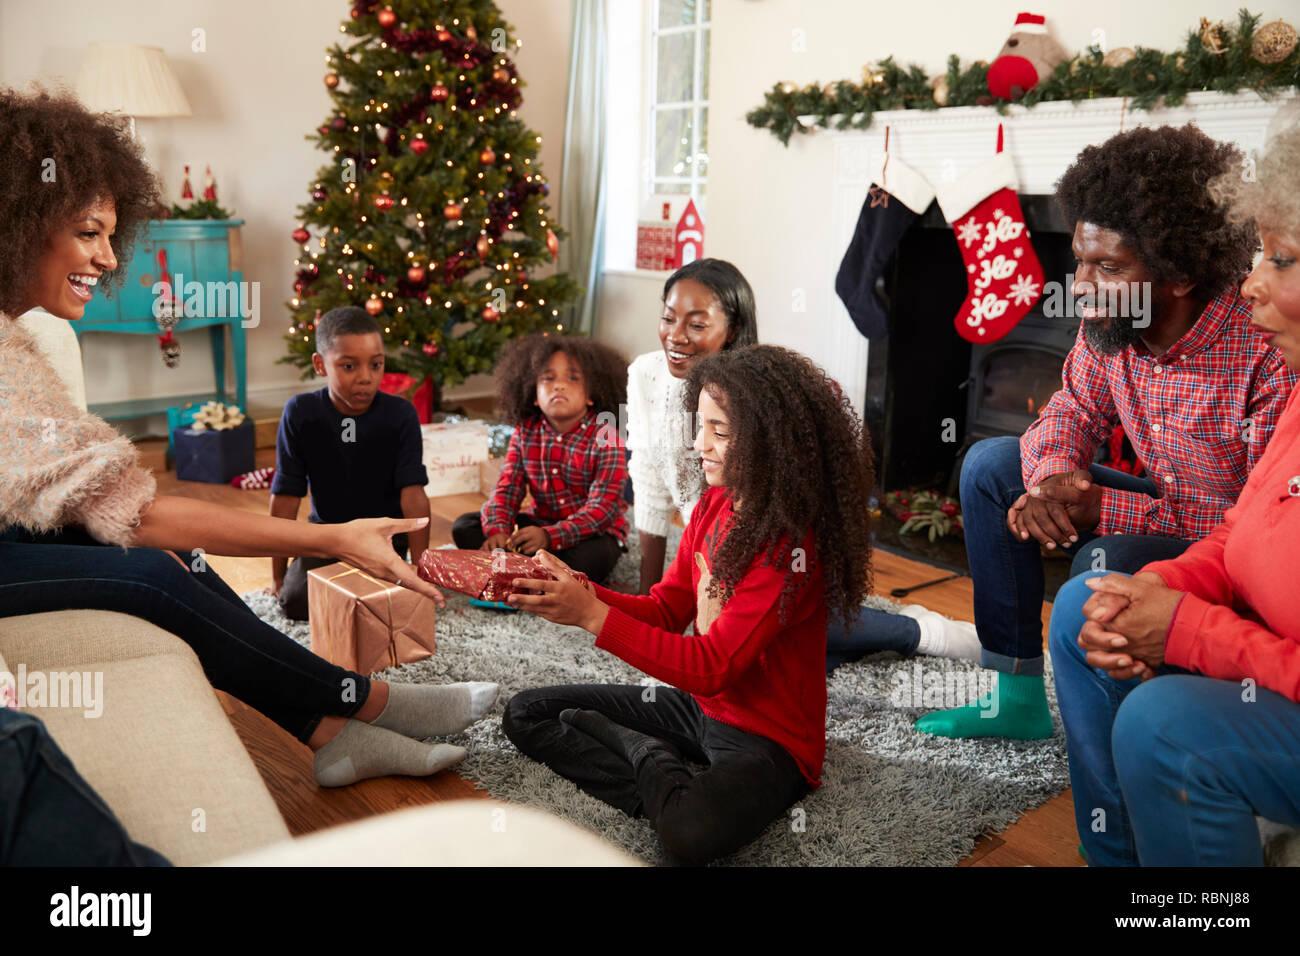 Geschenkideen Familie Weihnachten.Tochter Mutter Geschenk Als Multi Generation Familie Weihnachten